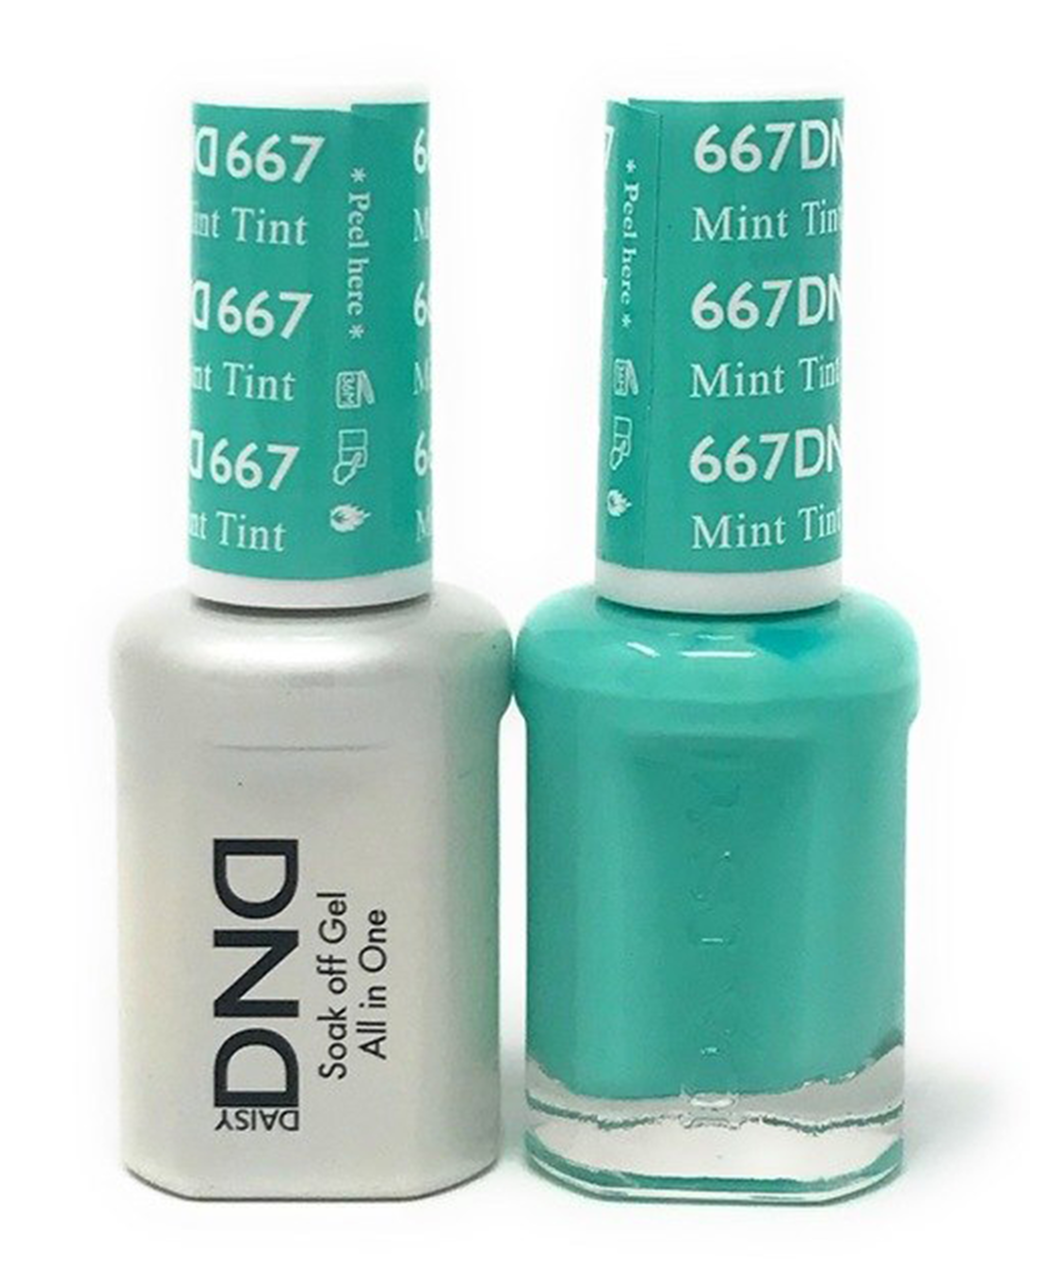 DND Duo Gel - G667 Mint Tint - Princess Nail Supply